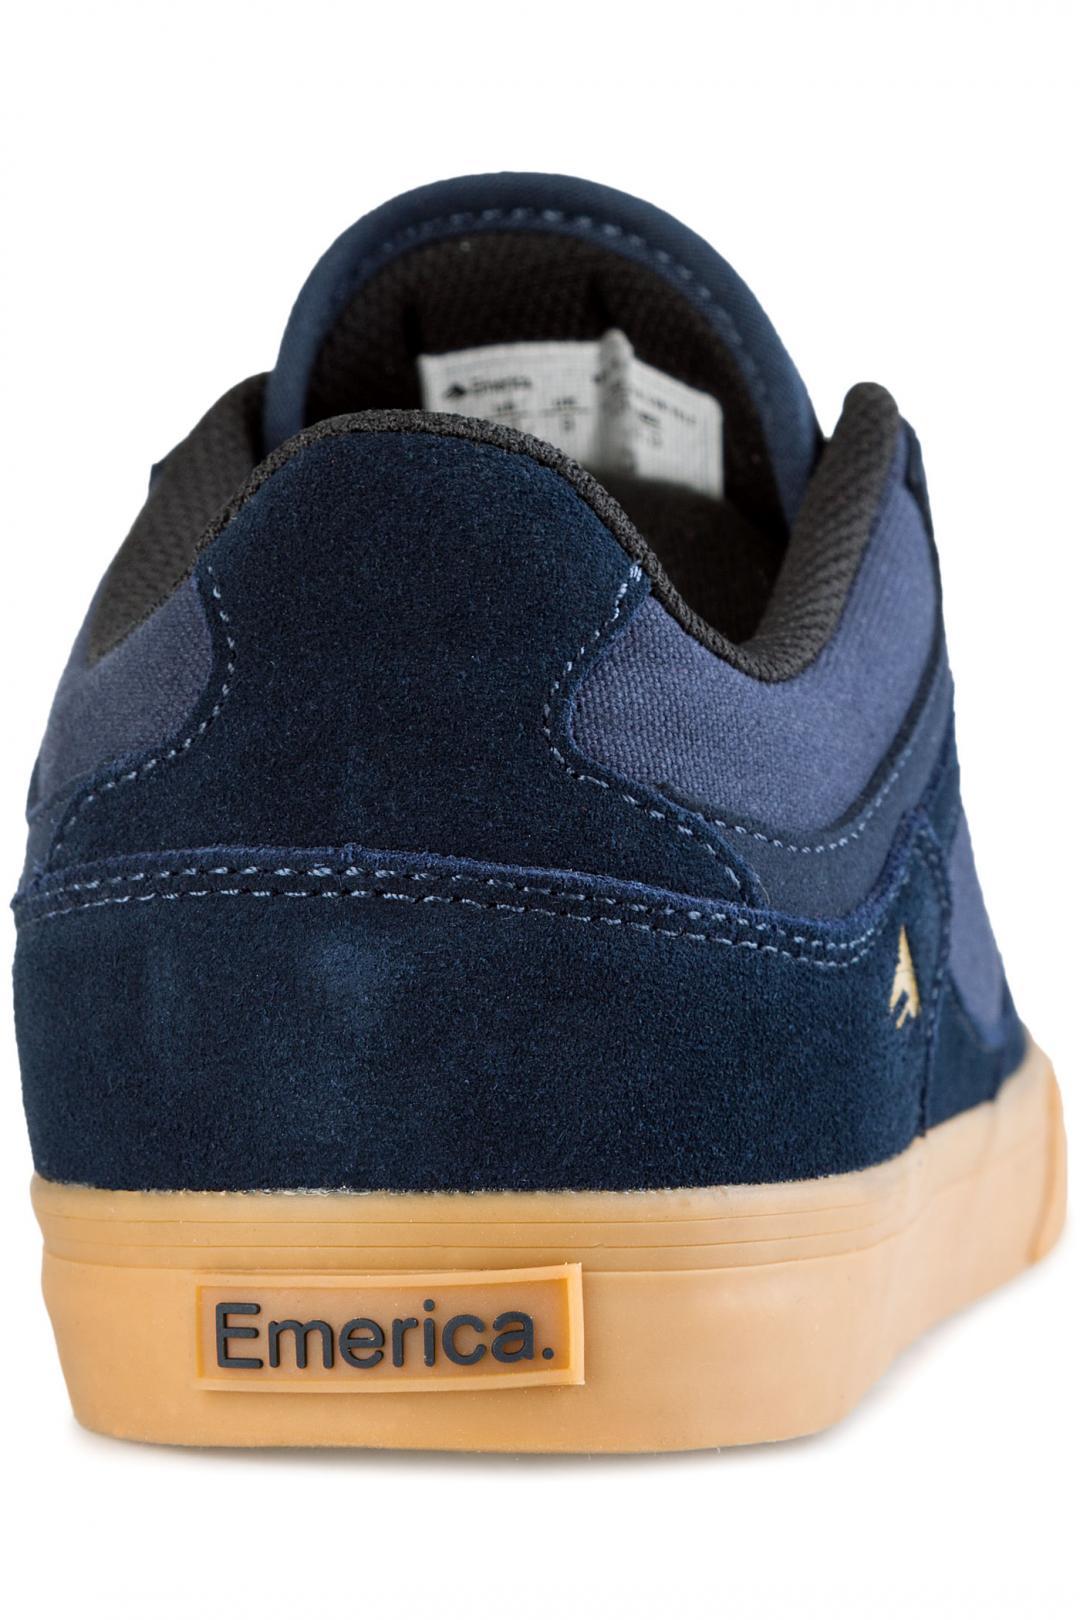 Uomo Emerica The HSU Low Vulc navy gum   Sneakers low top